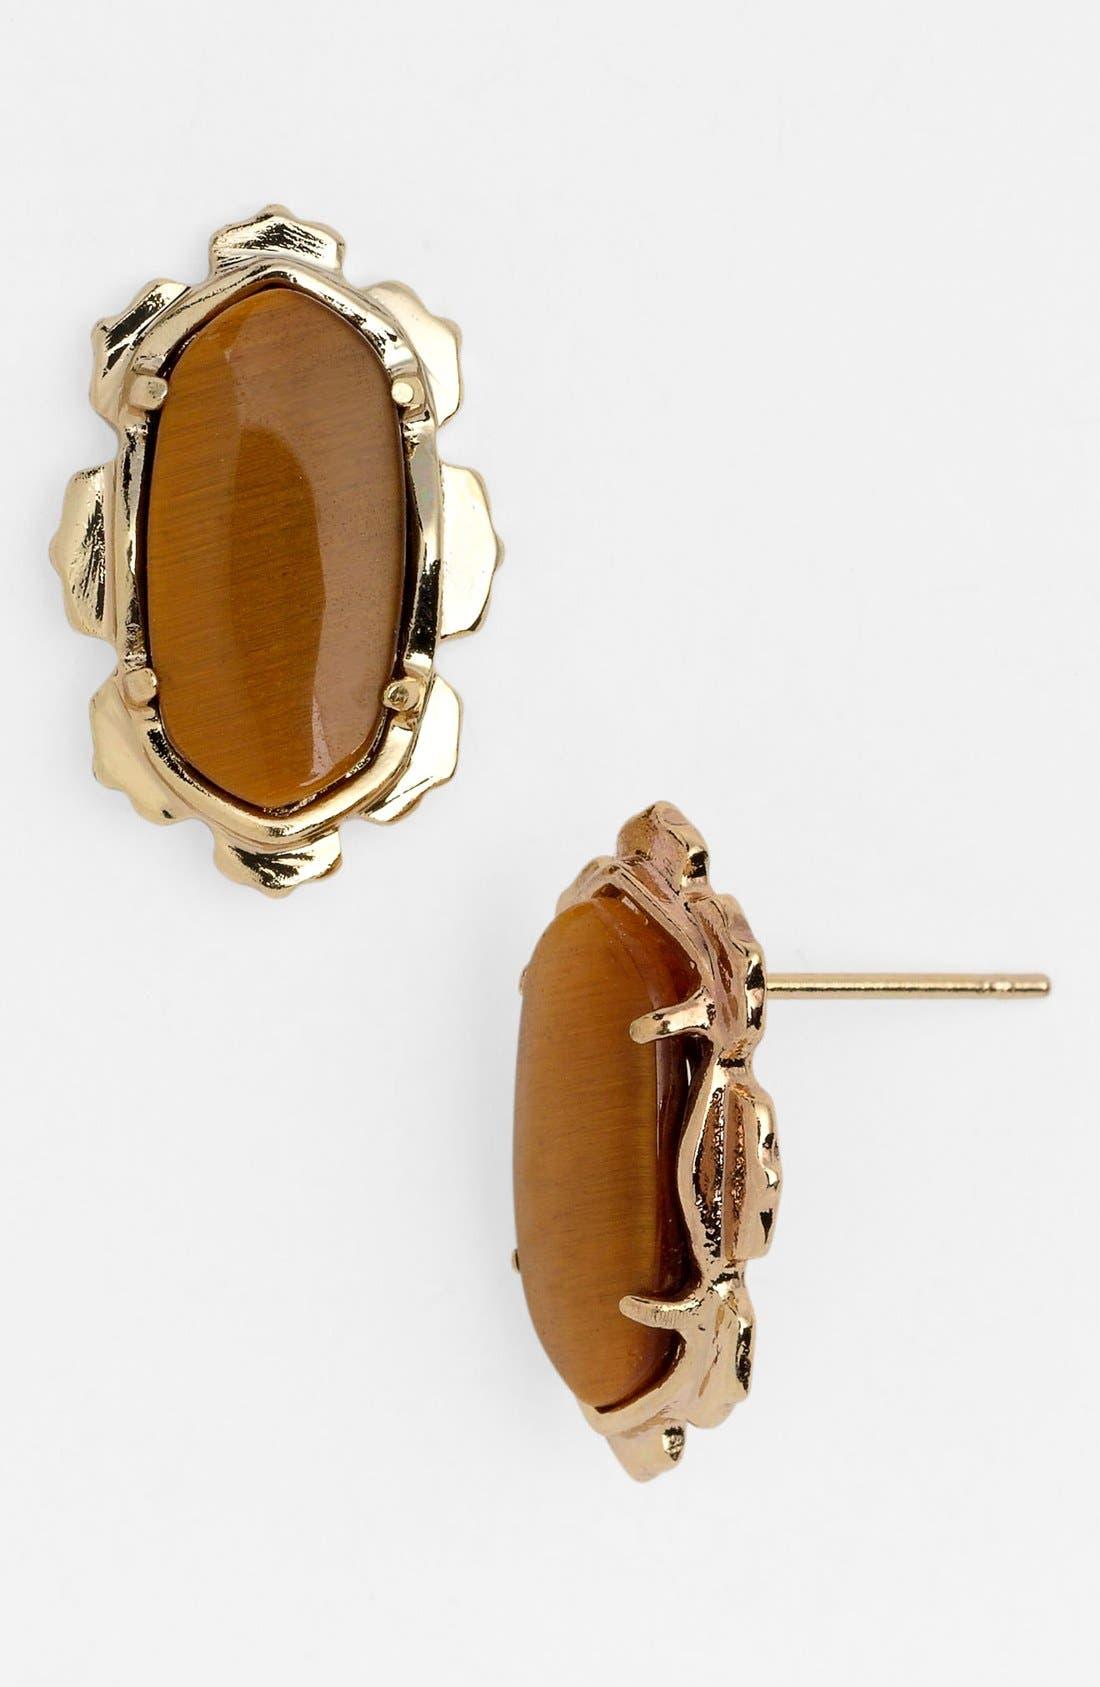 Alternate Image 1 Selected - Kendra Scott 'Shina' Oval Stone Stud Earrings